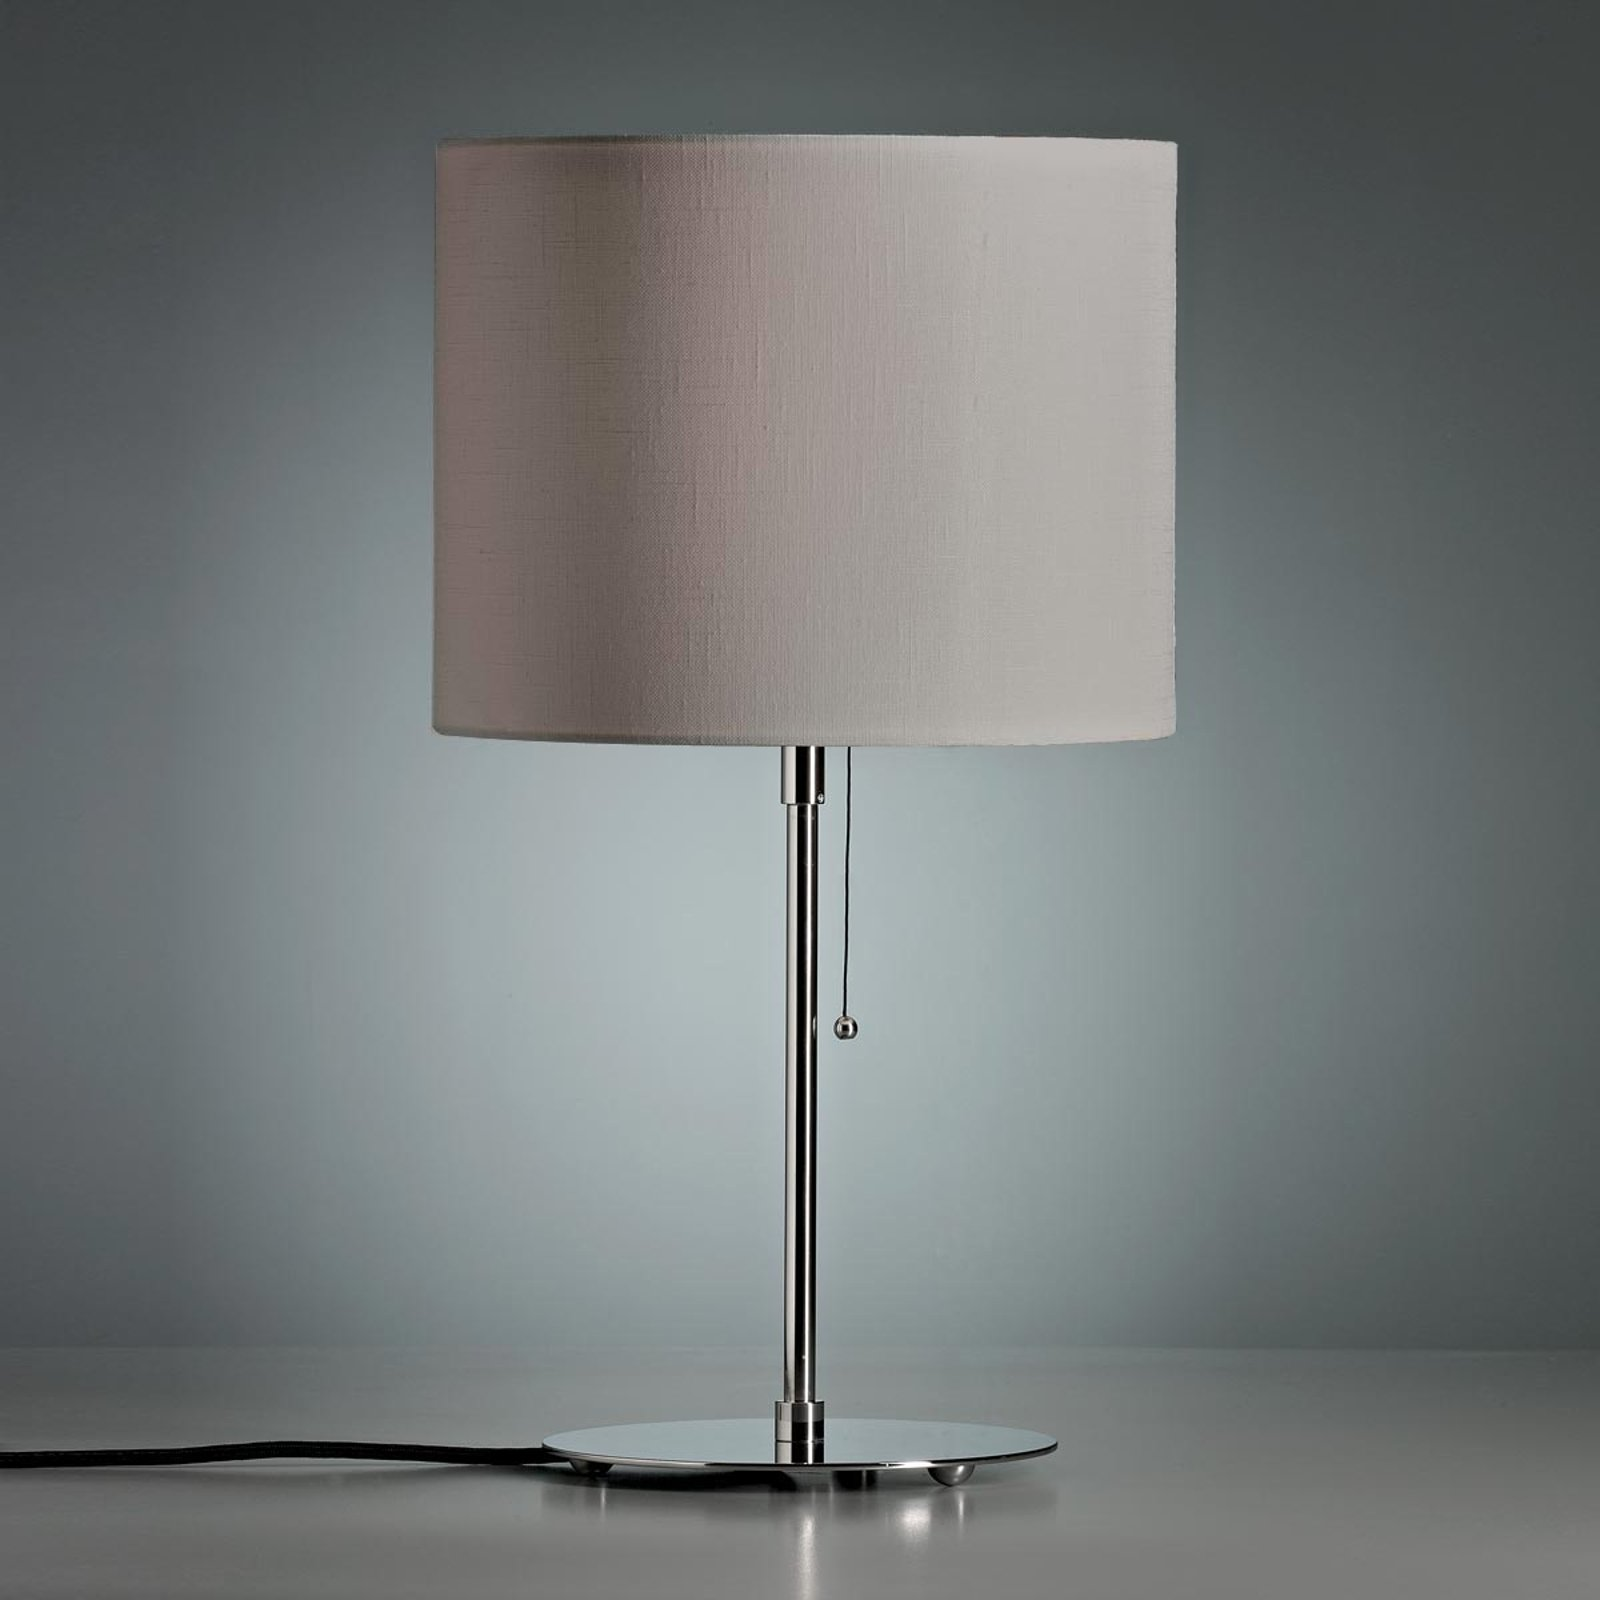 Bordlampe med farget linskjerm grå